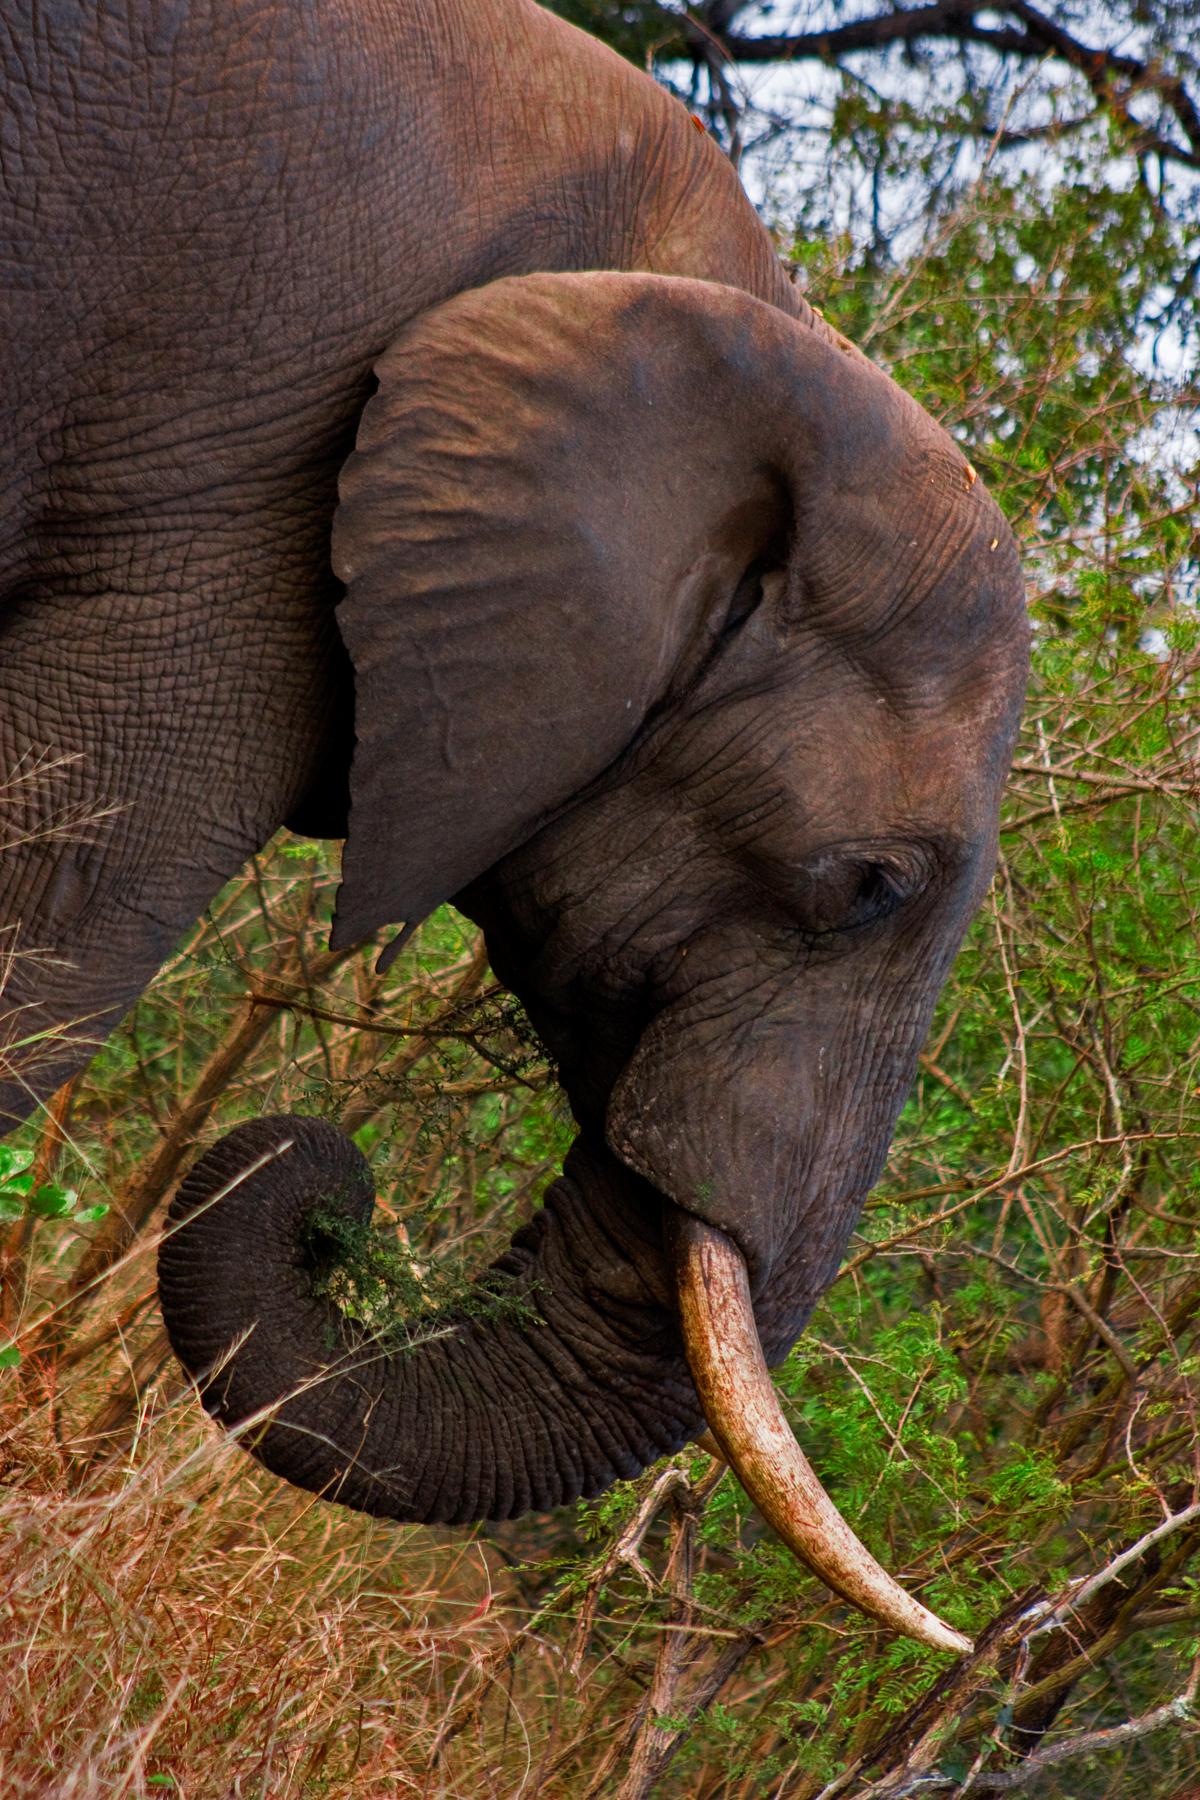 Kruger Park Elephant, Africa, South, Park, Perspective, HQ Photo